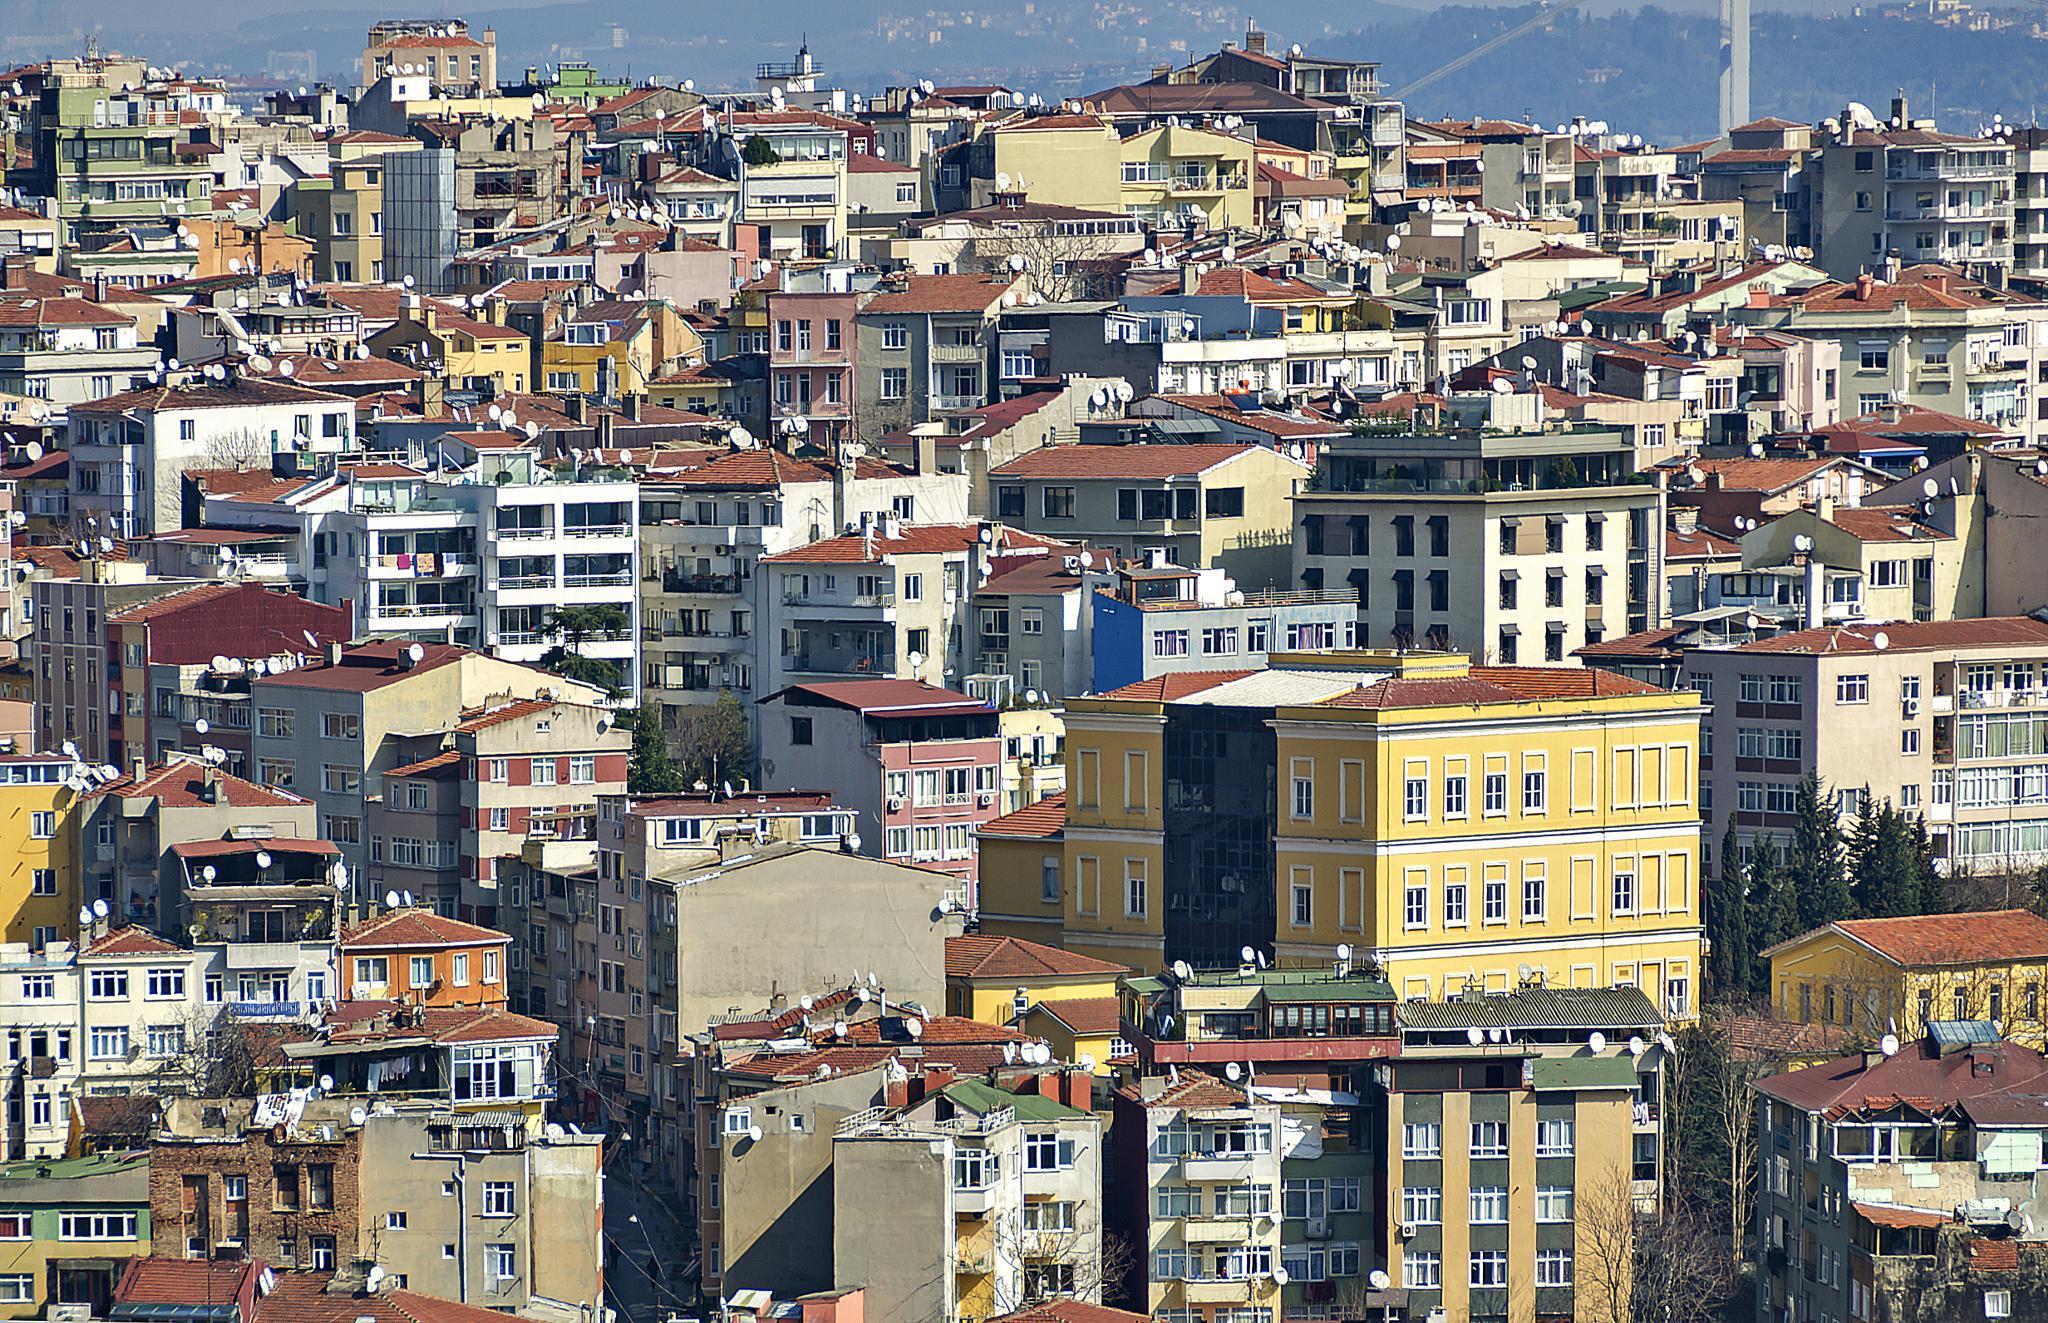 ISTANBUL by HeidiGK